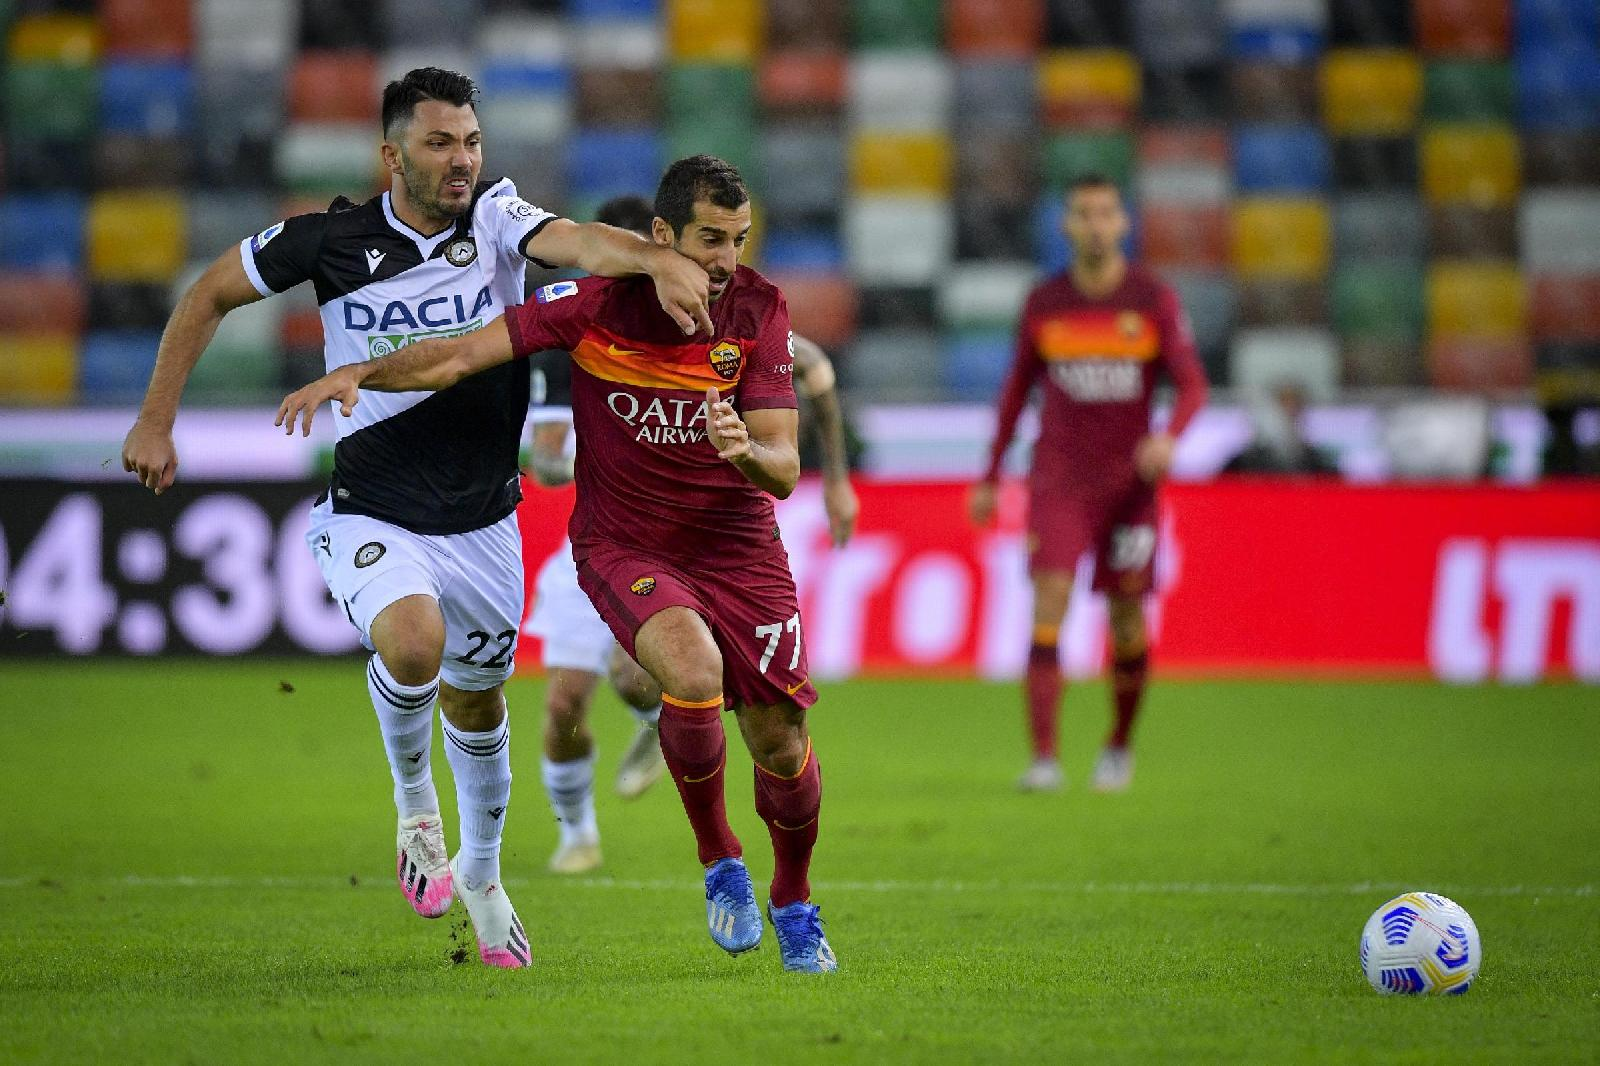 Udinese Roma 0 1 Pedro Sigla La Prima Vittoria In Campionato